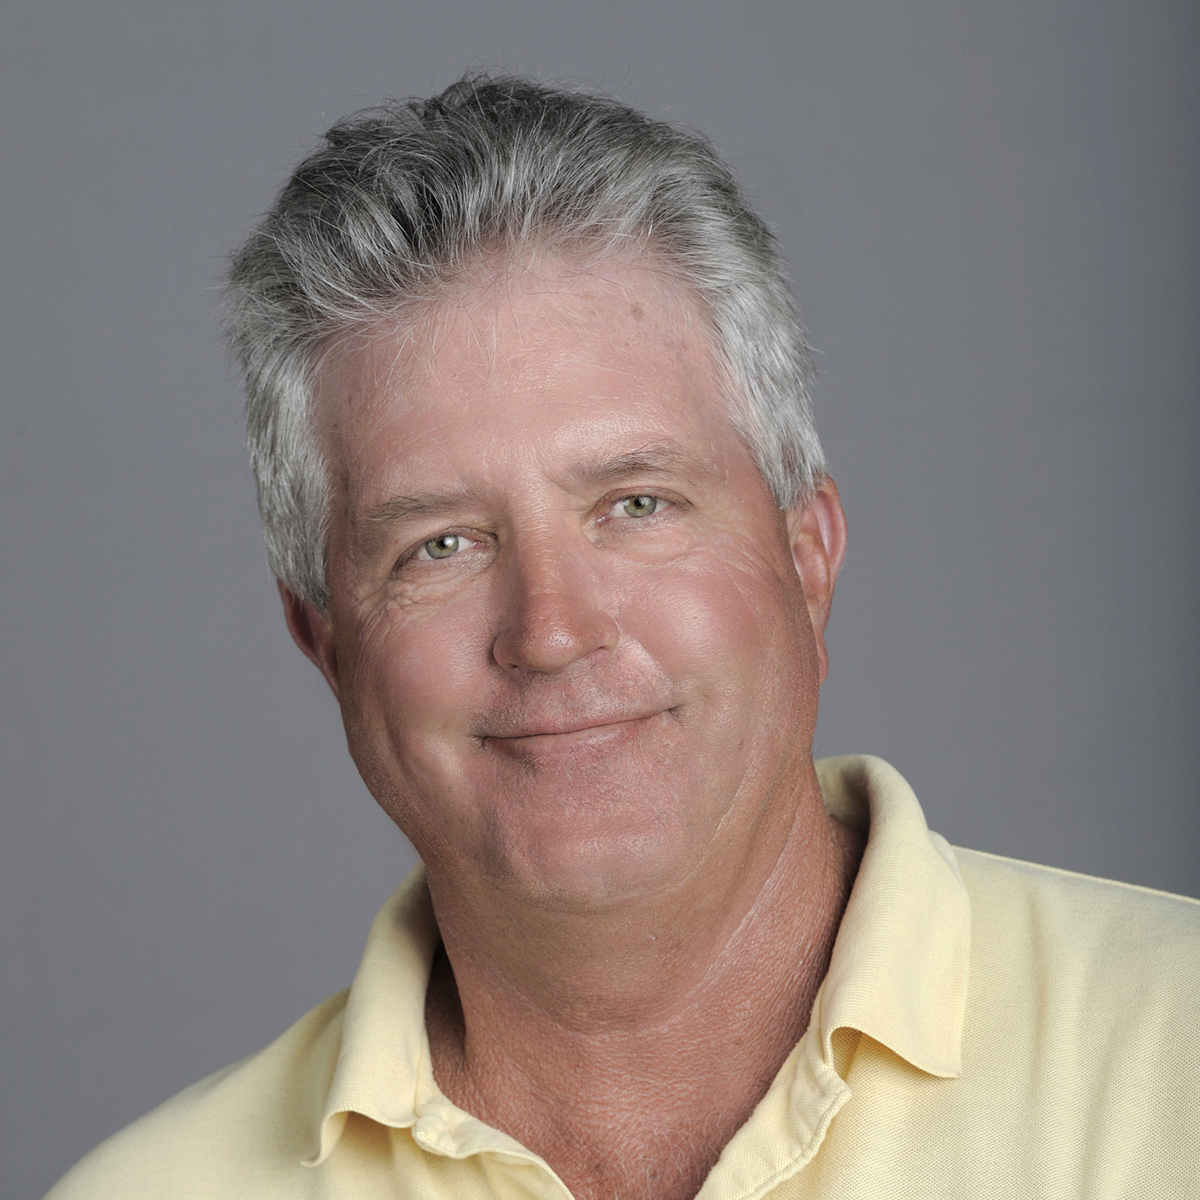 Greg Selement